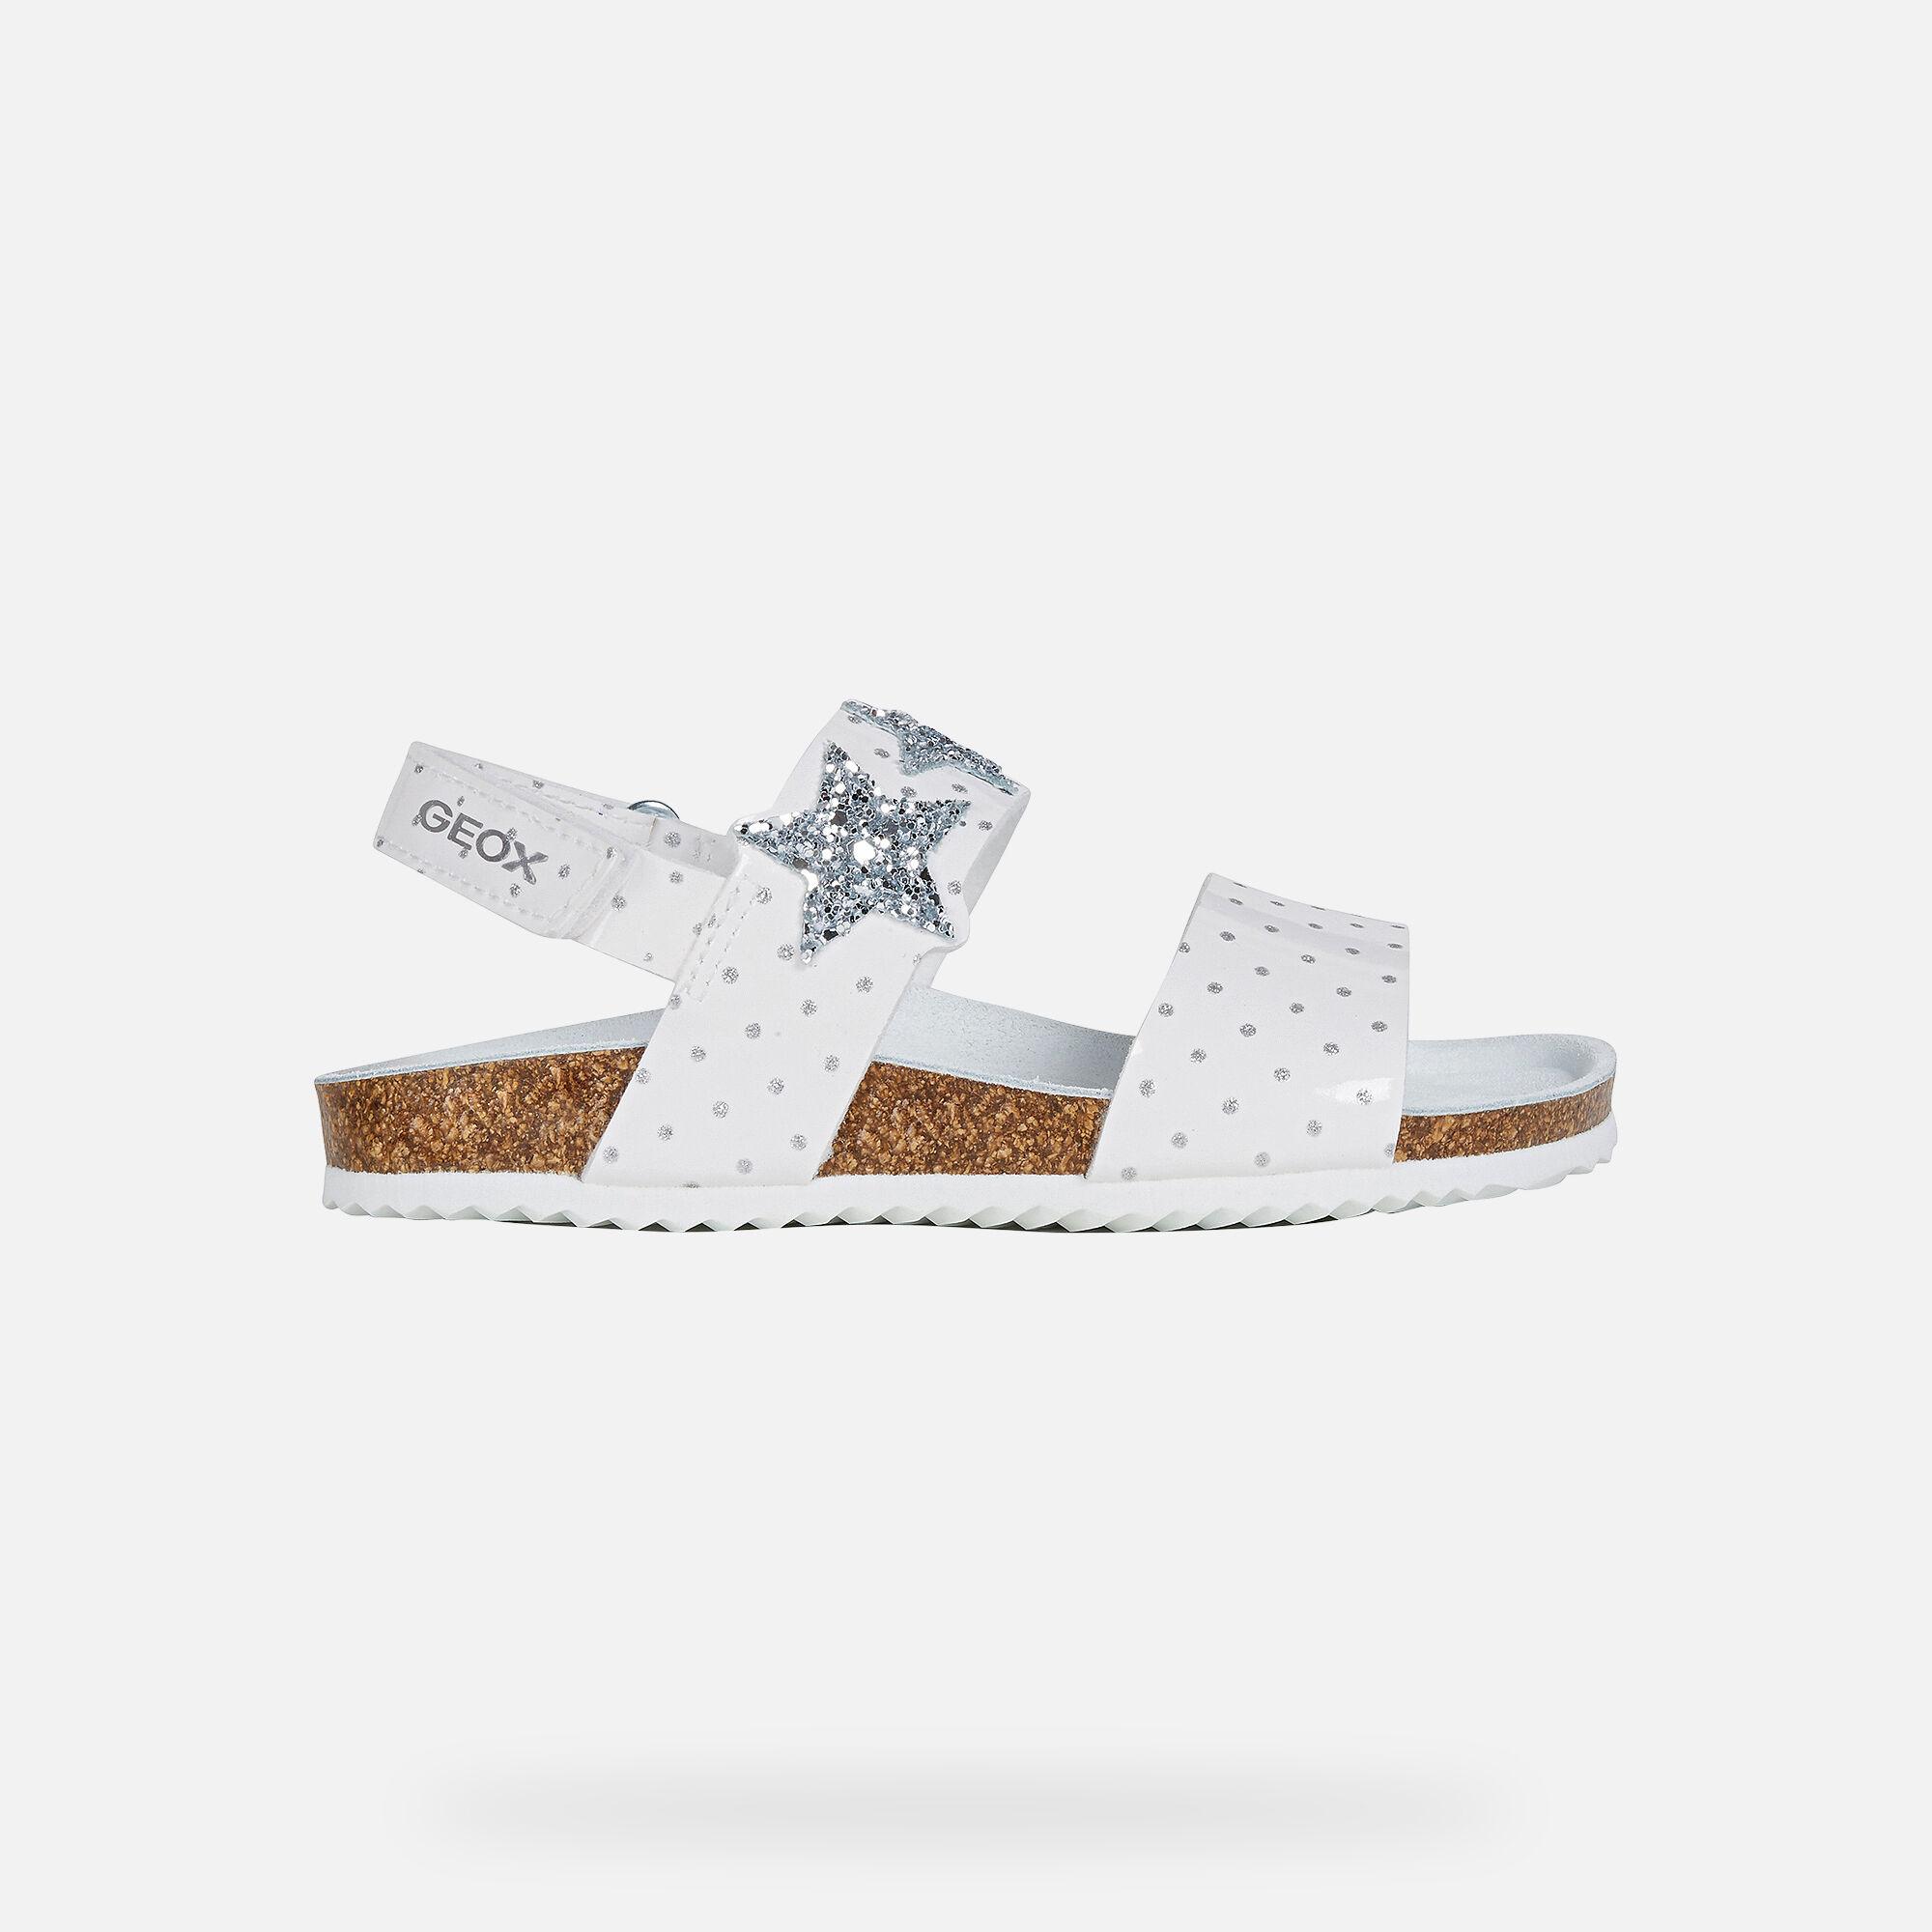 Geox ADRIEL GIRL: Weiß Sandalen | Geox ®